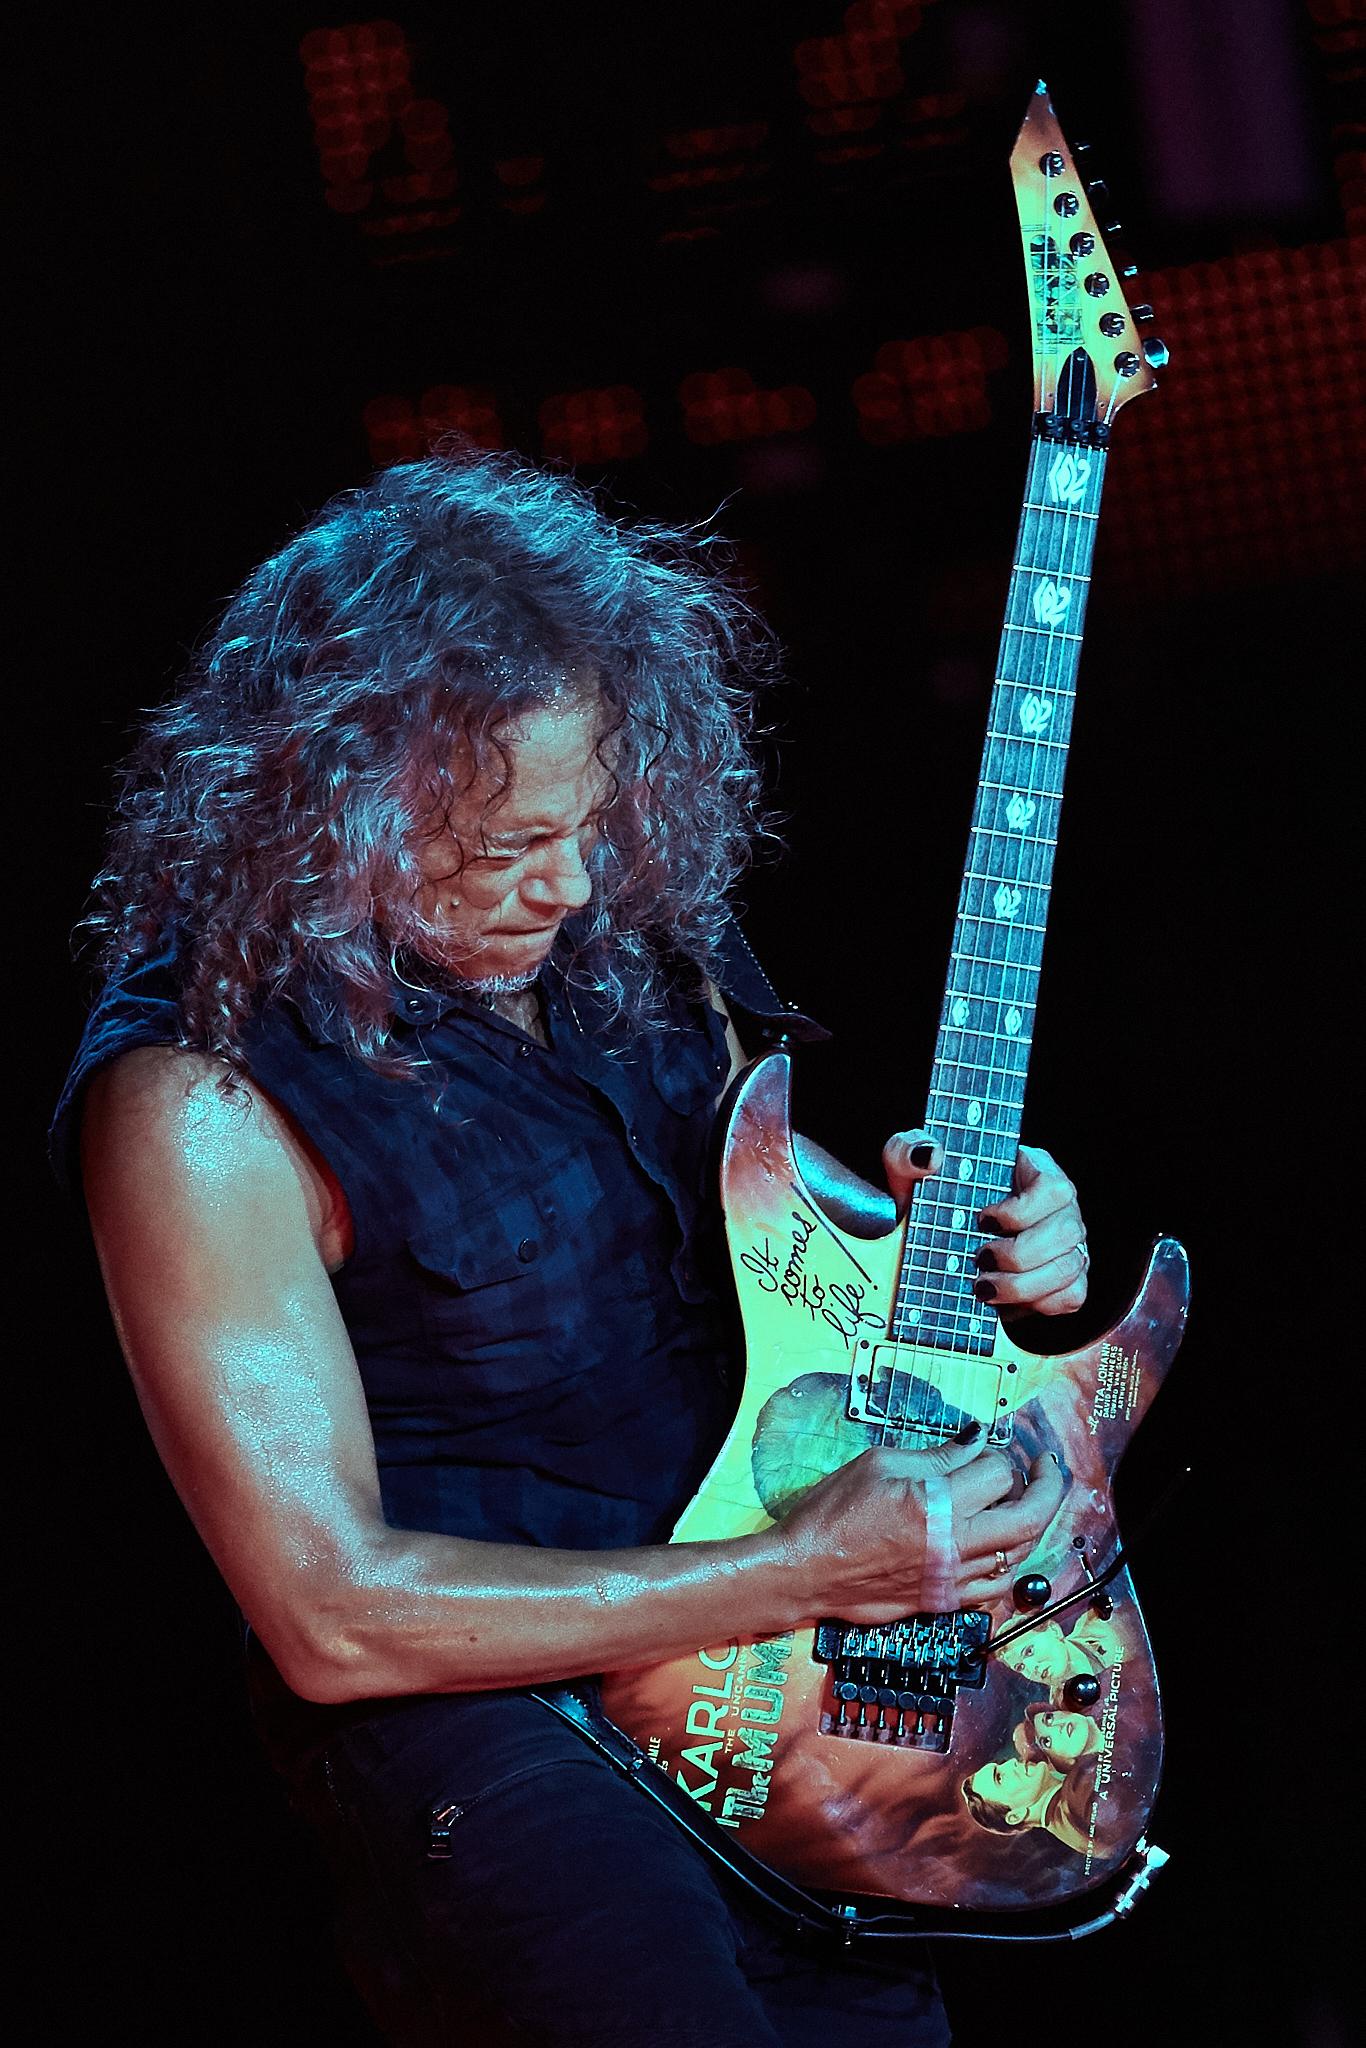 Metallica_at_US_Bank_Stadium_Minneapolis_First_Rock_Show_08-20_2016_Photo_By_Joe_Lemke_027.jpg